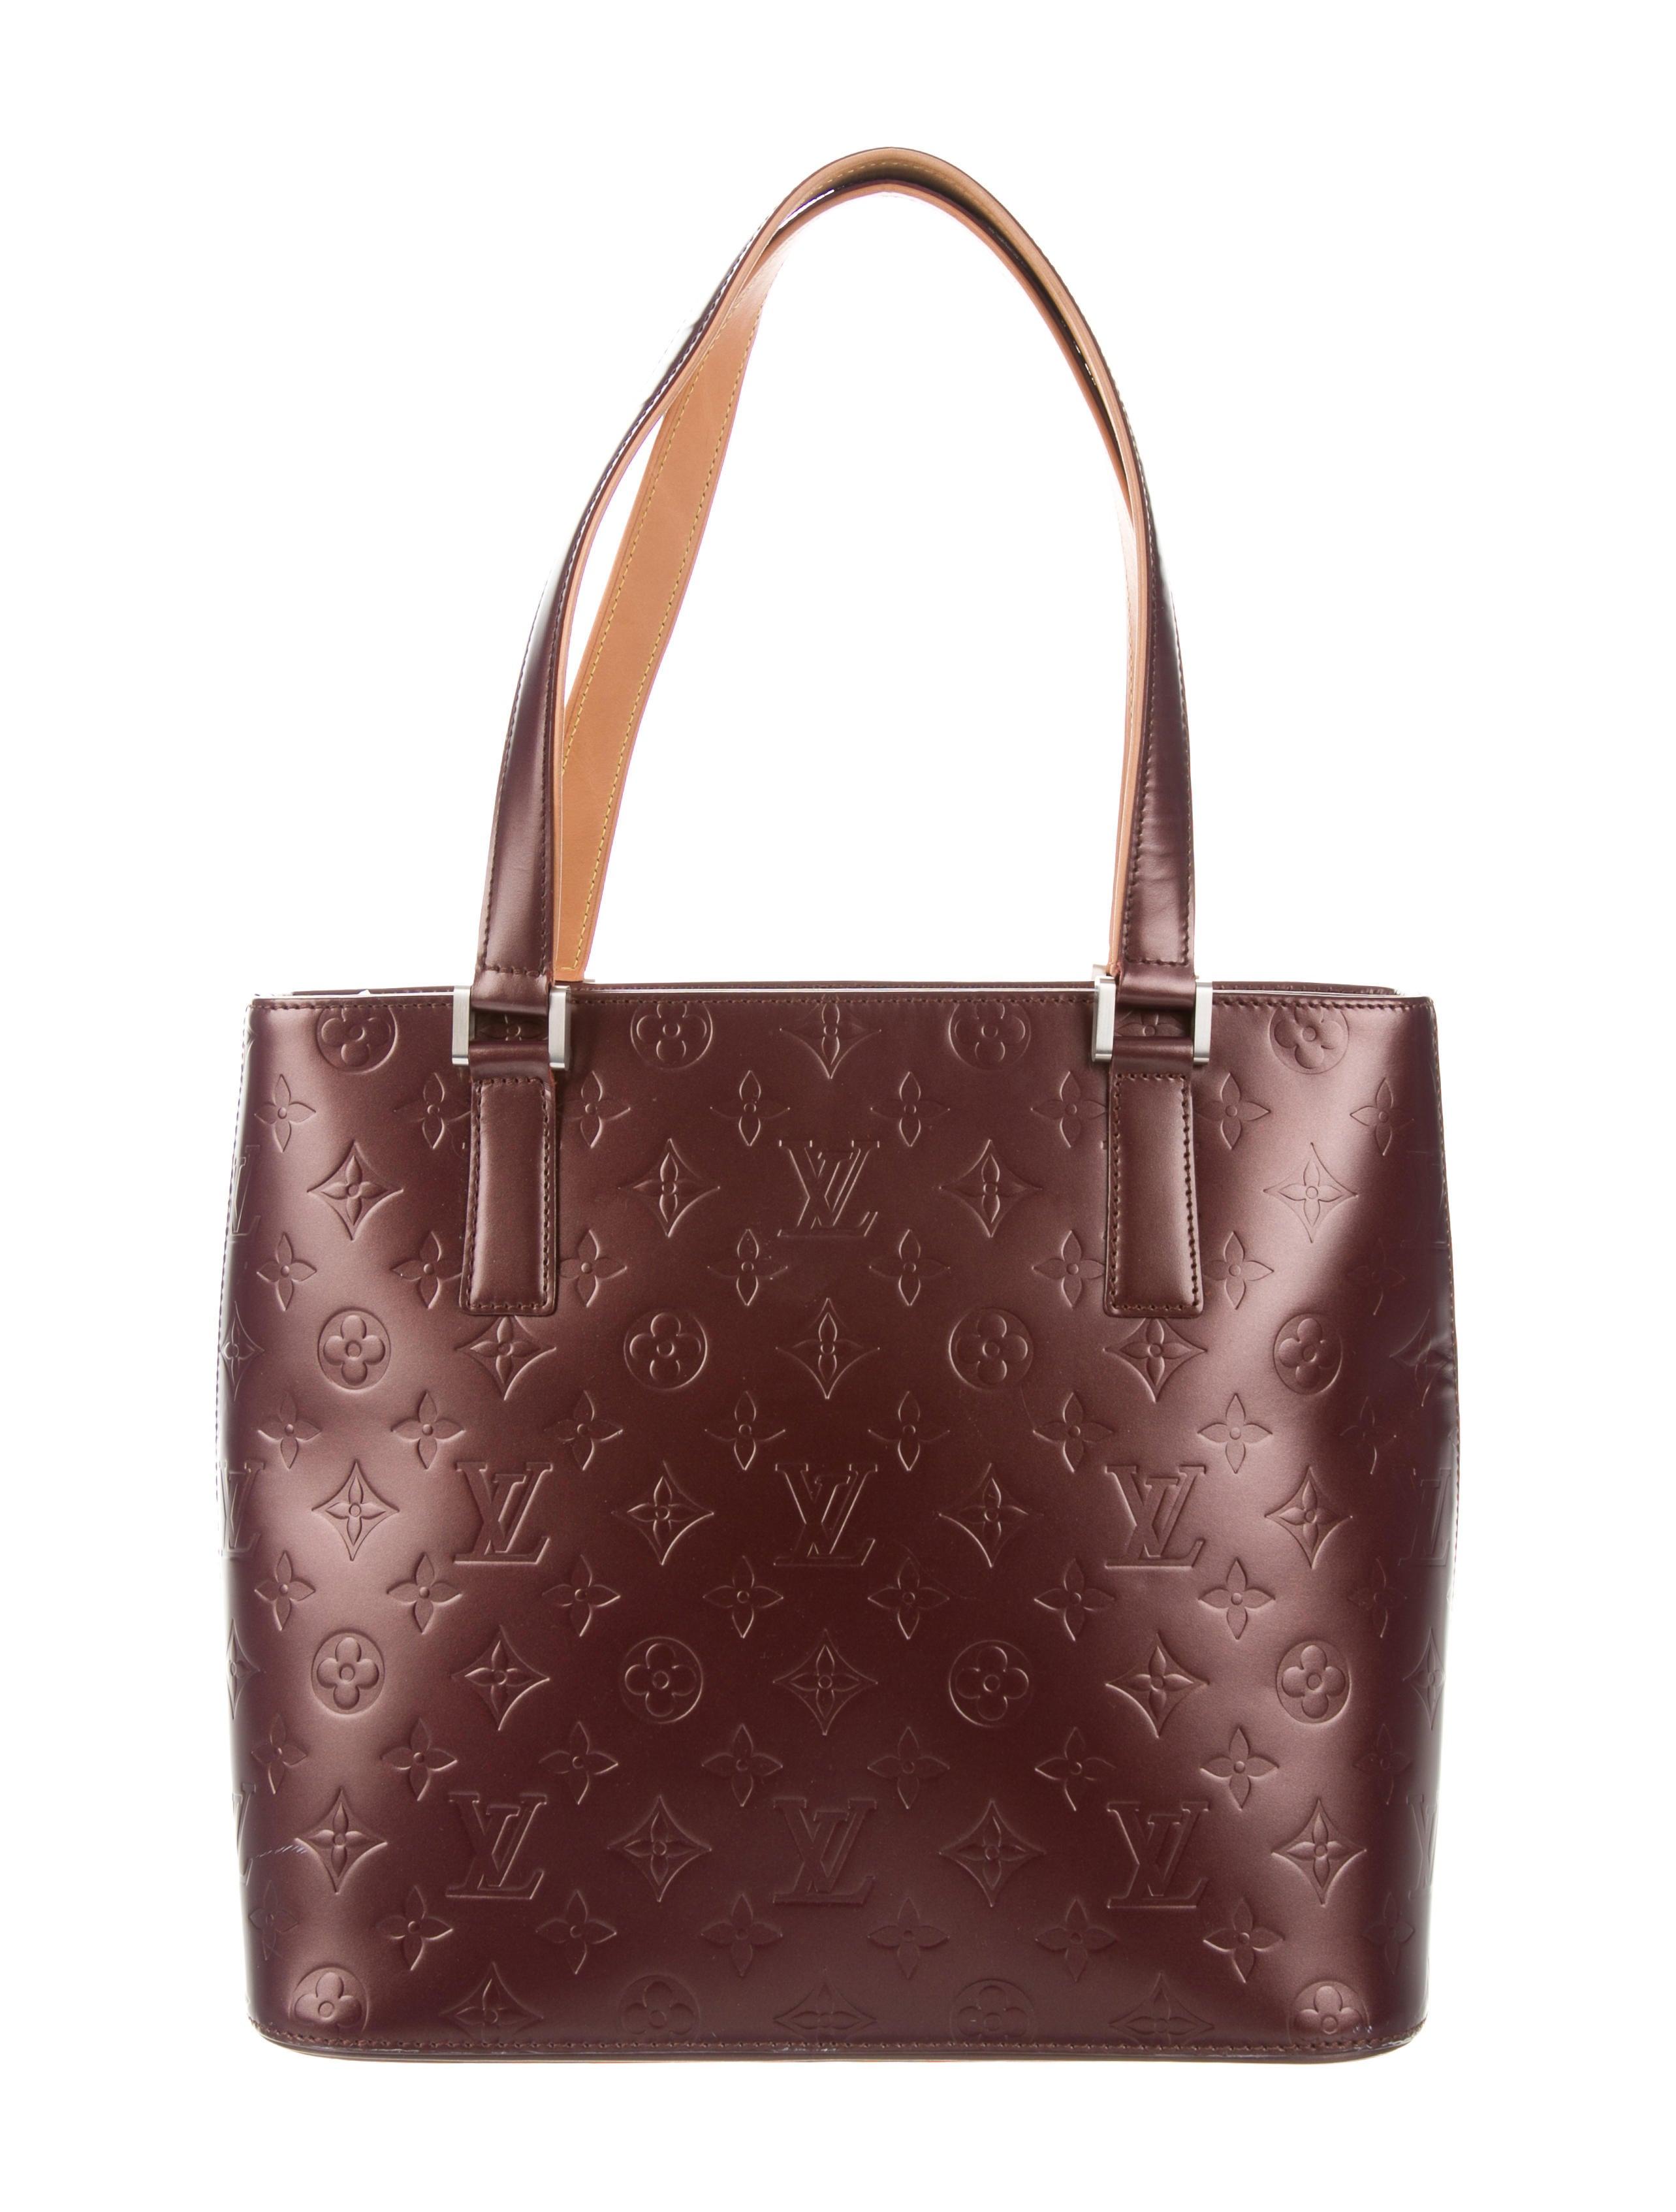 7e666d850ab2 Louis Vuitton Monogram Mat Stockton - Handbags - LOU161326